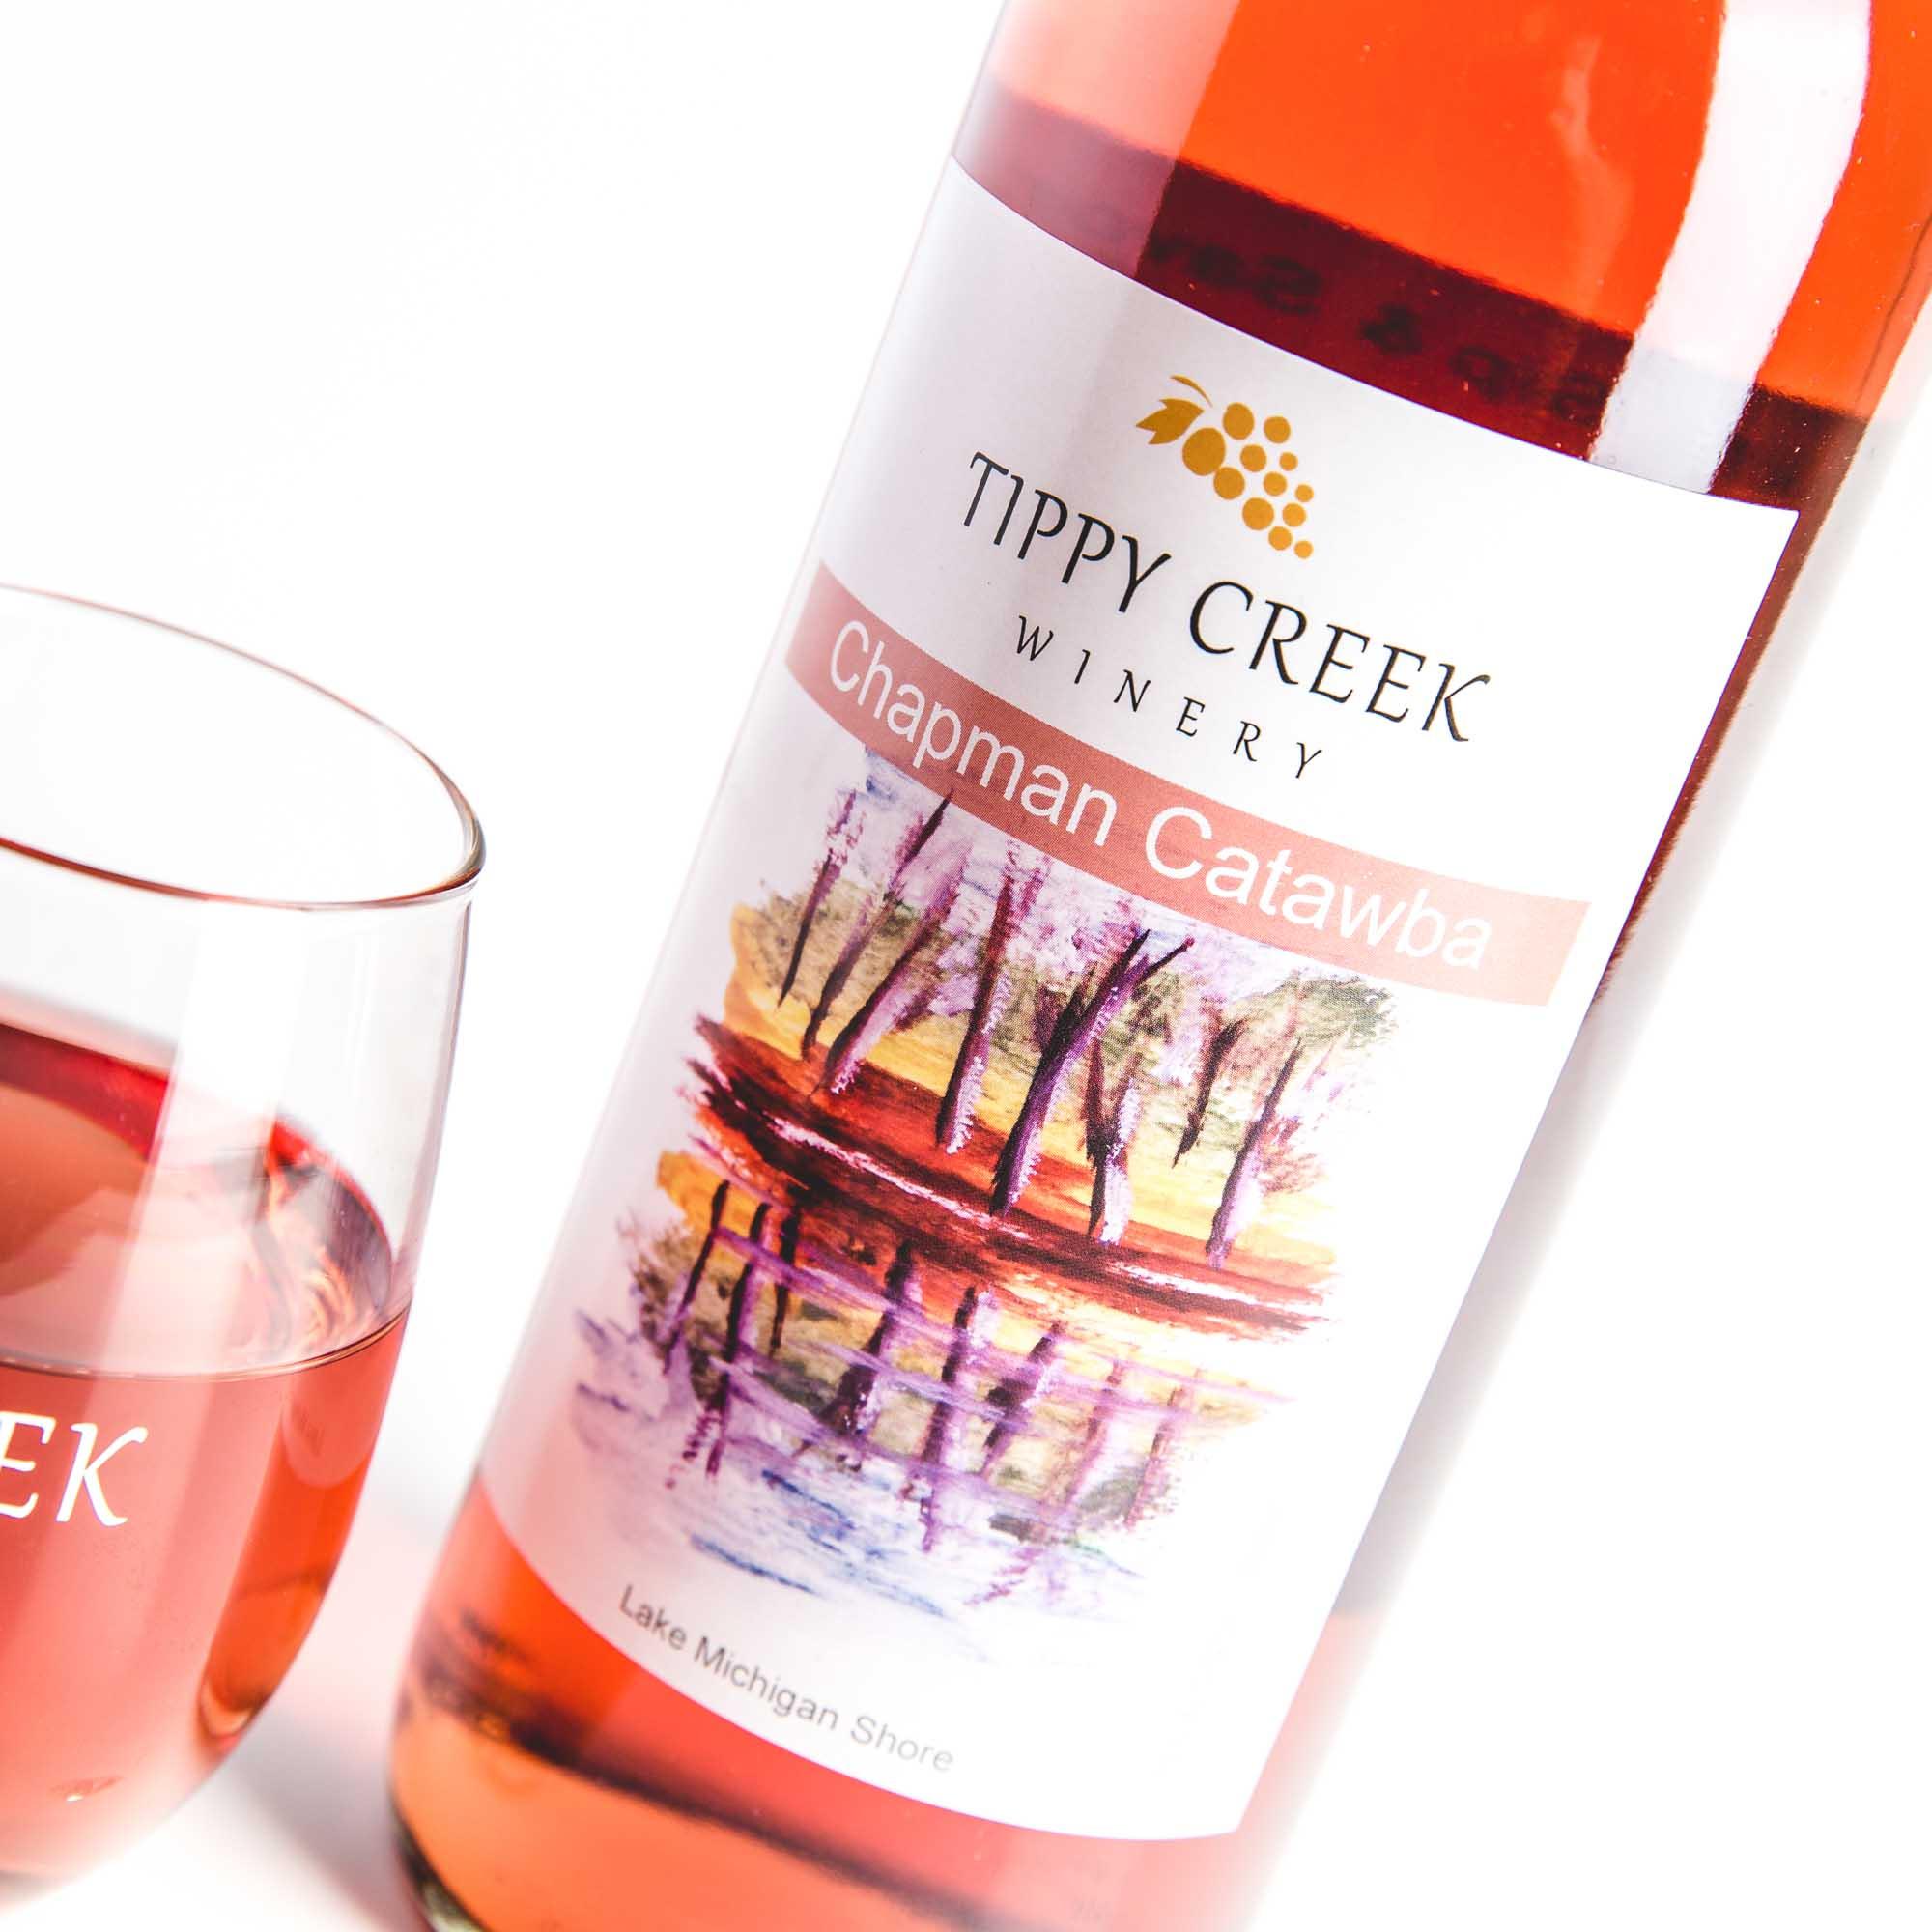 Chapman Catawba. Rose Wine by Tippy Creek Winery.